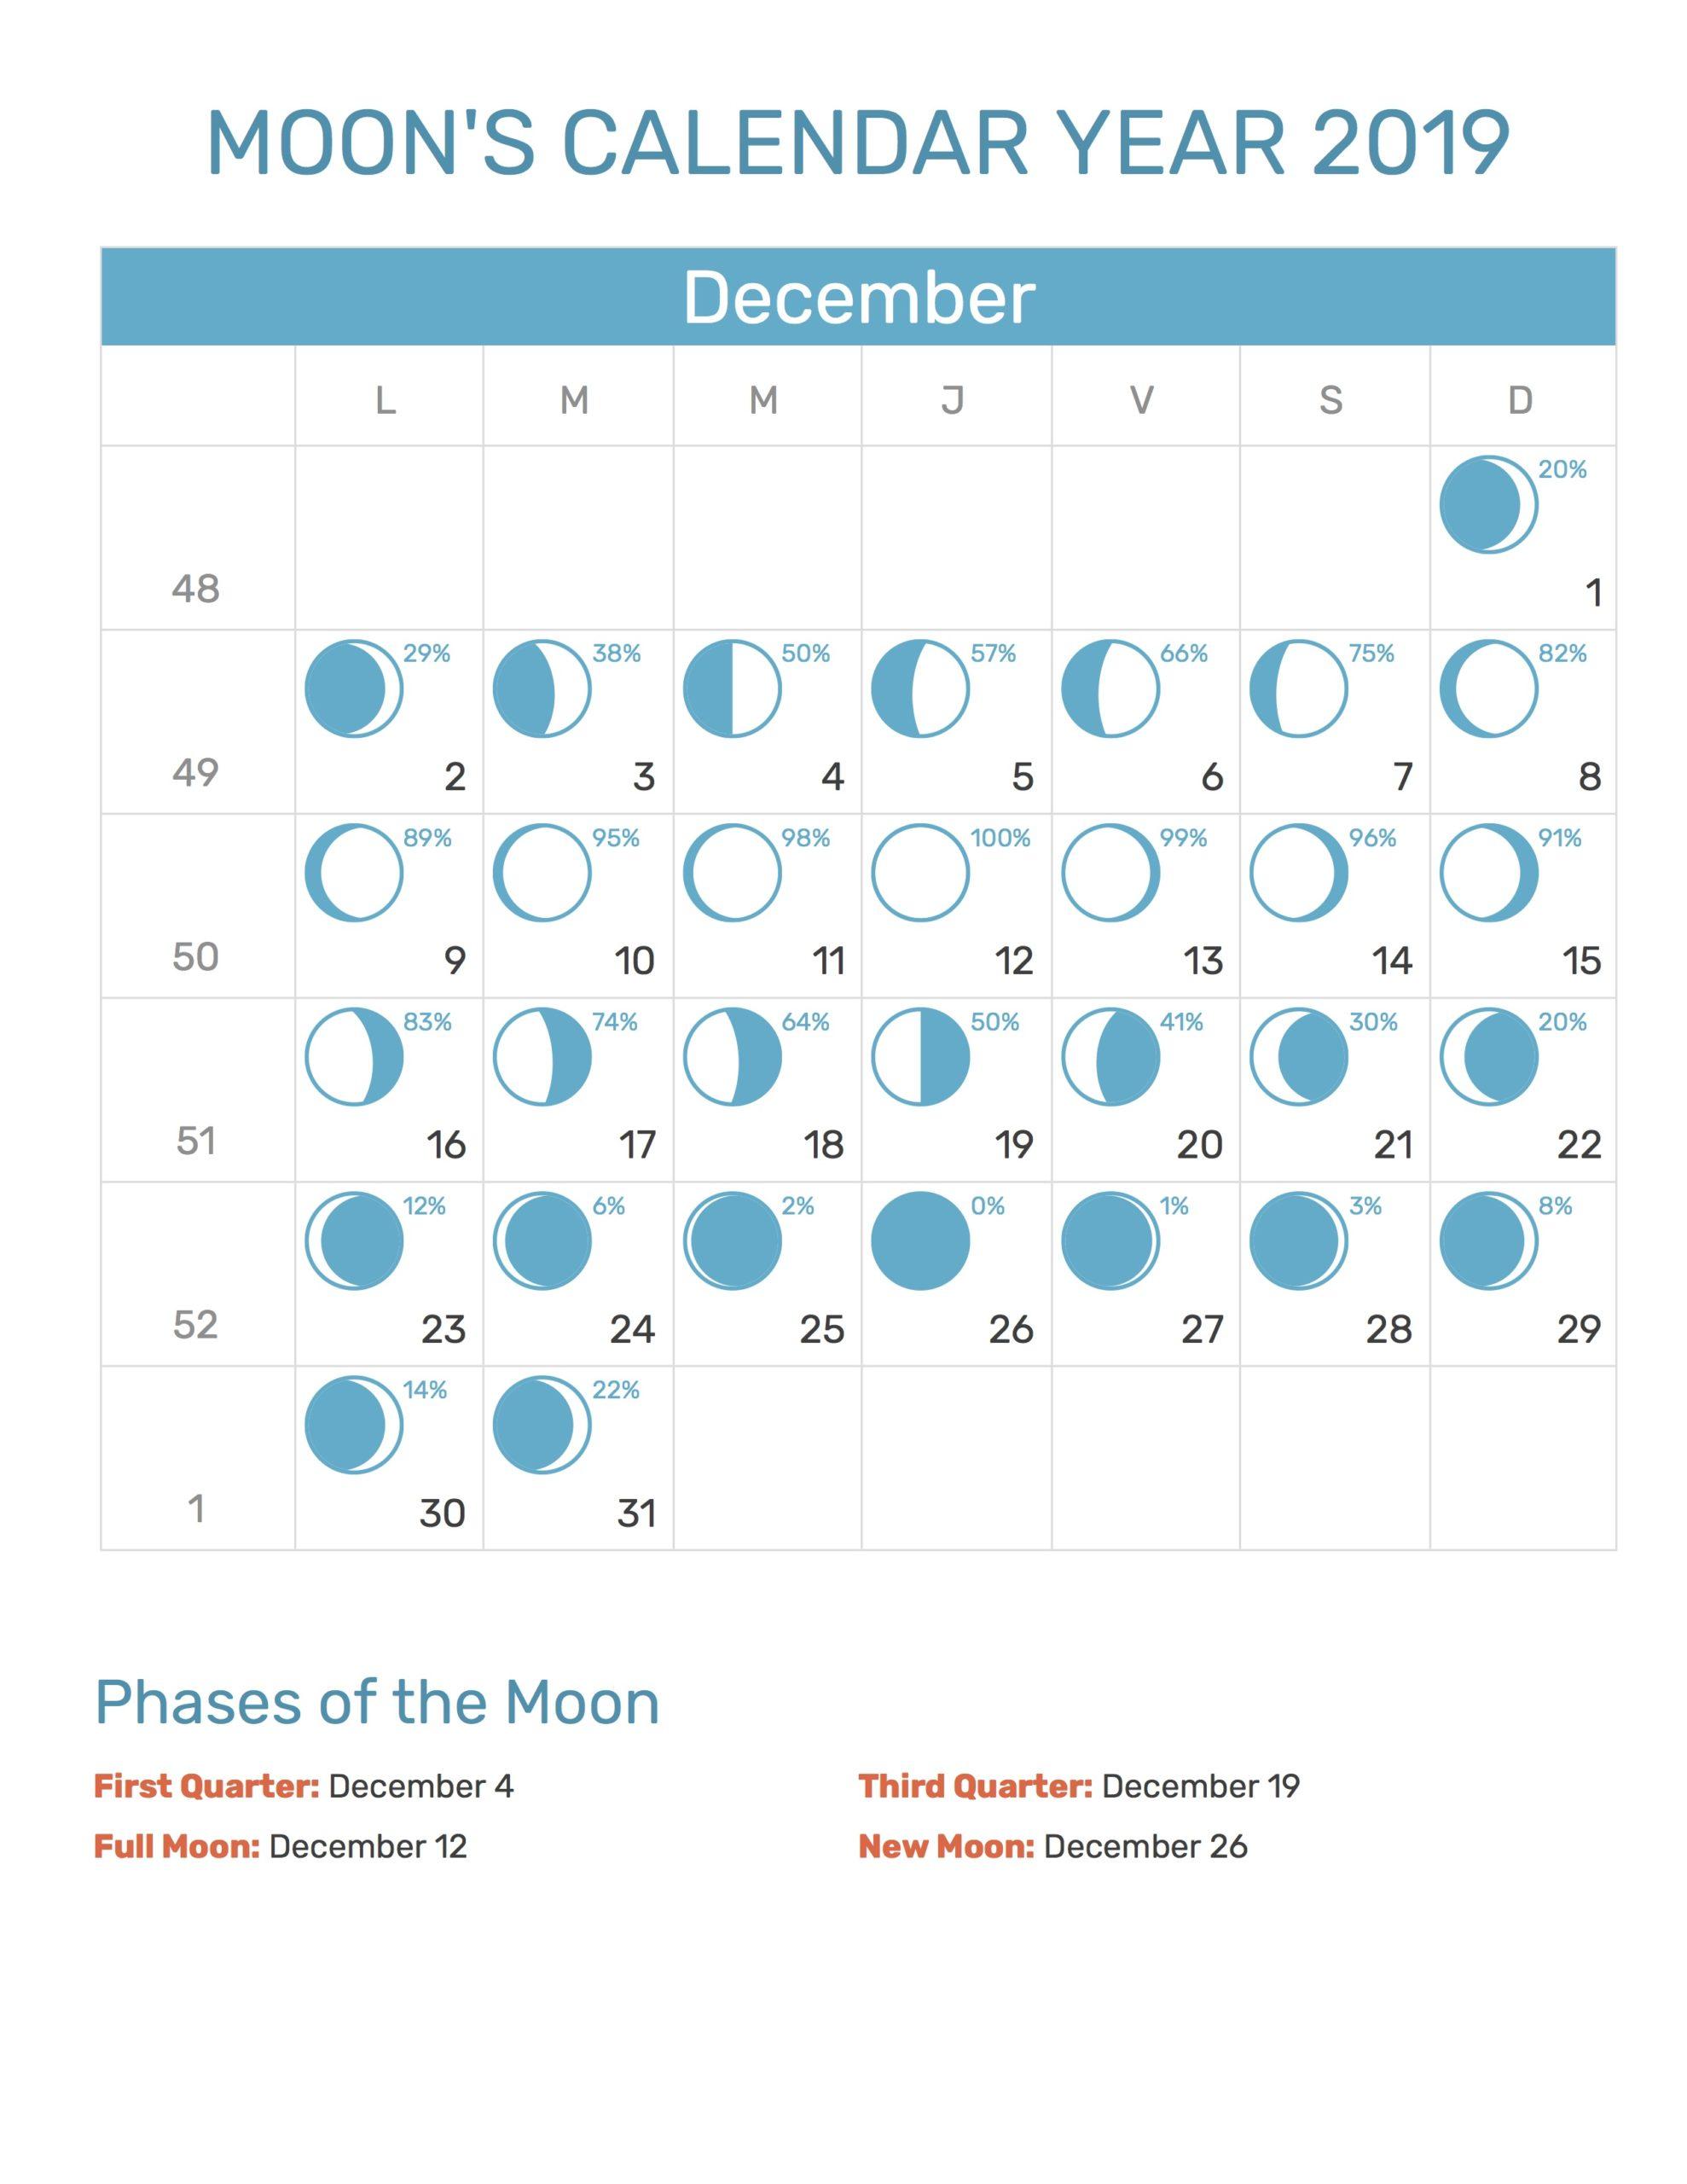 2019 December Calendar Moon Phases